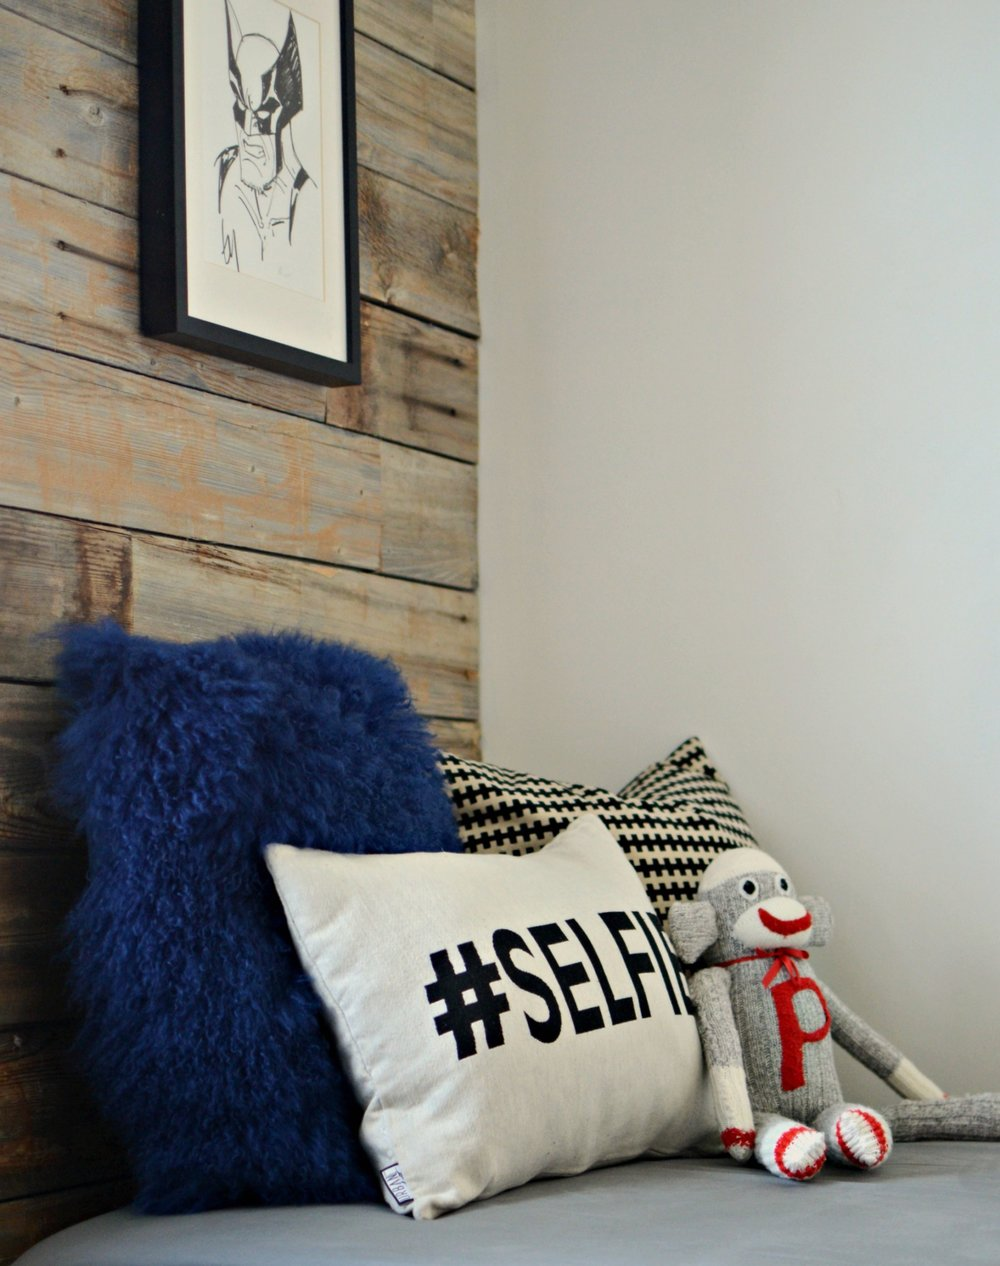 calgary-interior-designer-canadiana-boys-room-bed-pillows.jpg